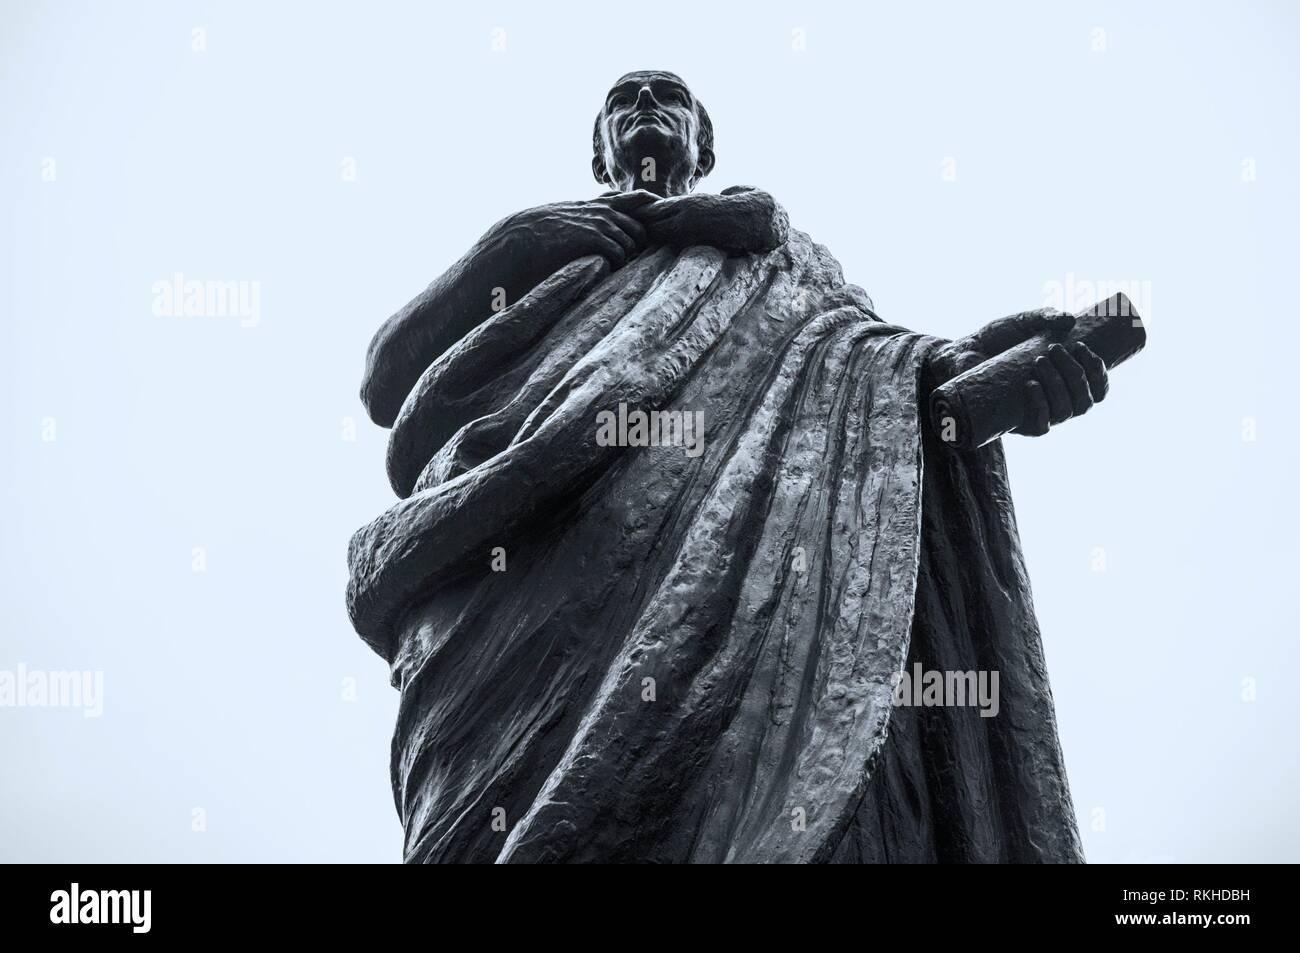 Bronze Statue of Seneca the Younger, Roman Stoic philosopher. Cordoba, Spain. - Stock Image